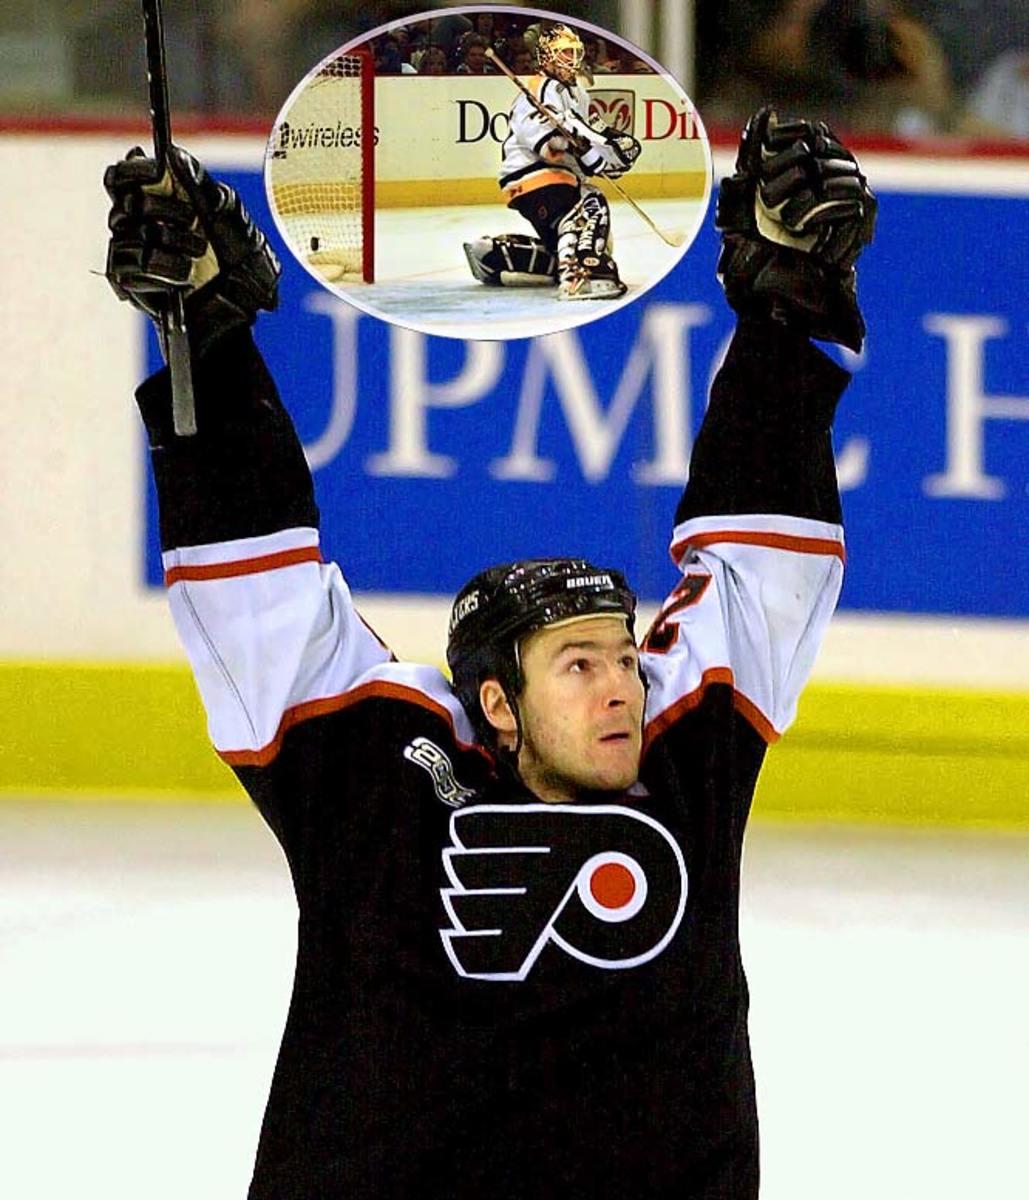 Flyers 2, Penguins 1 (5 OT)